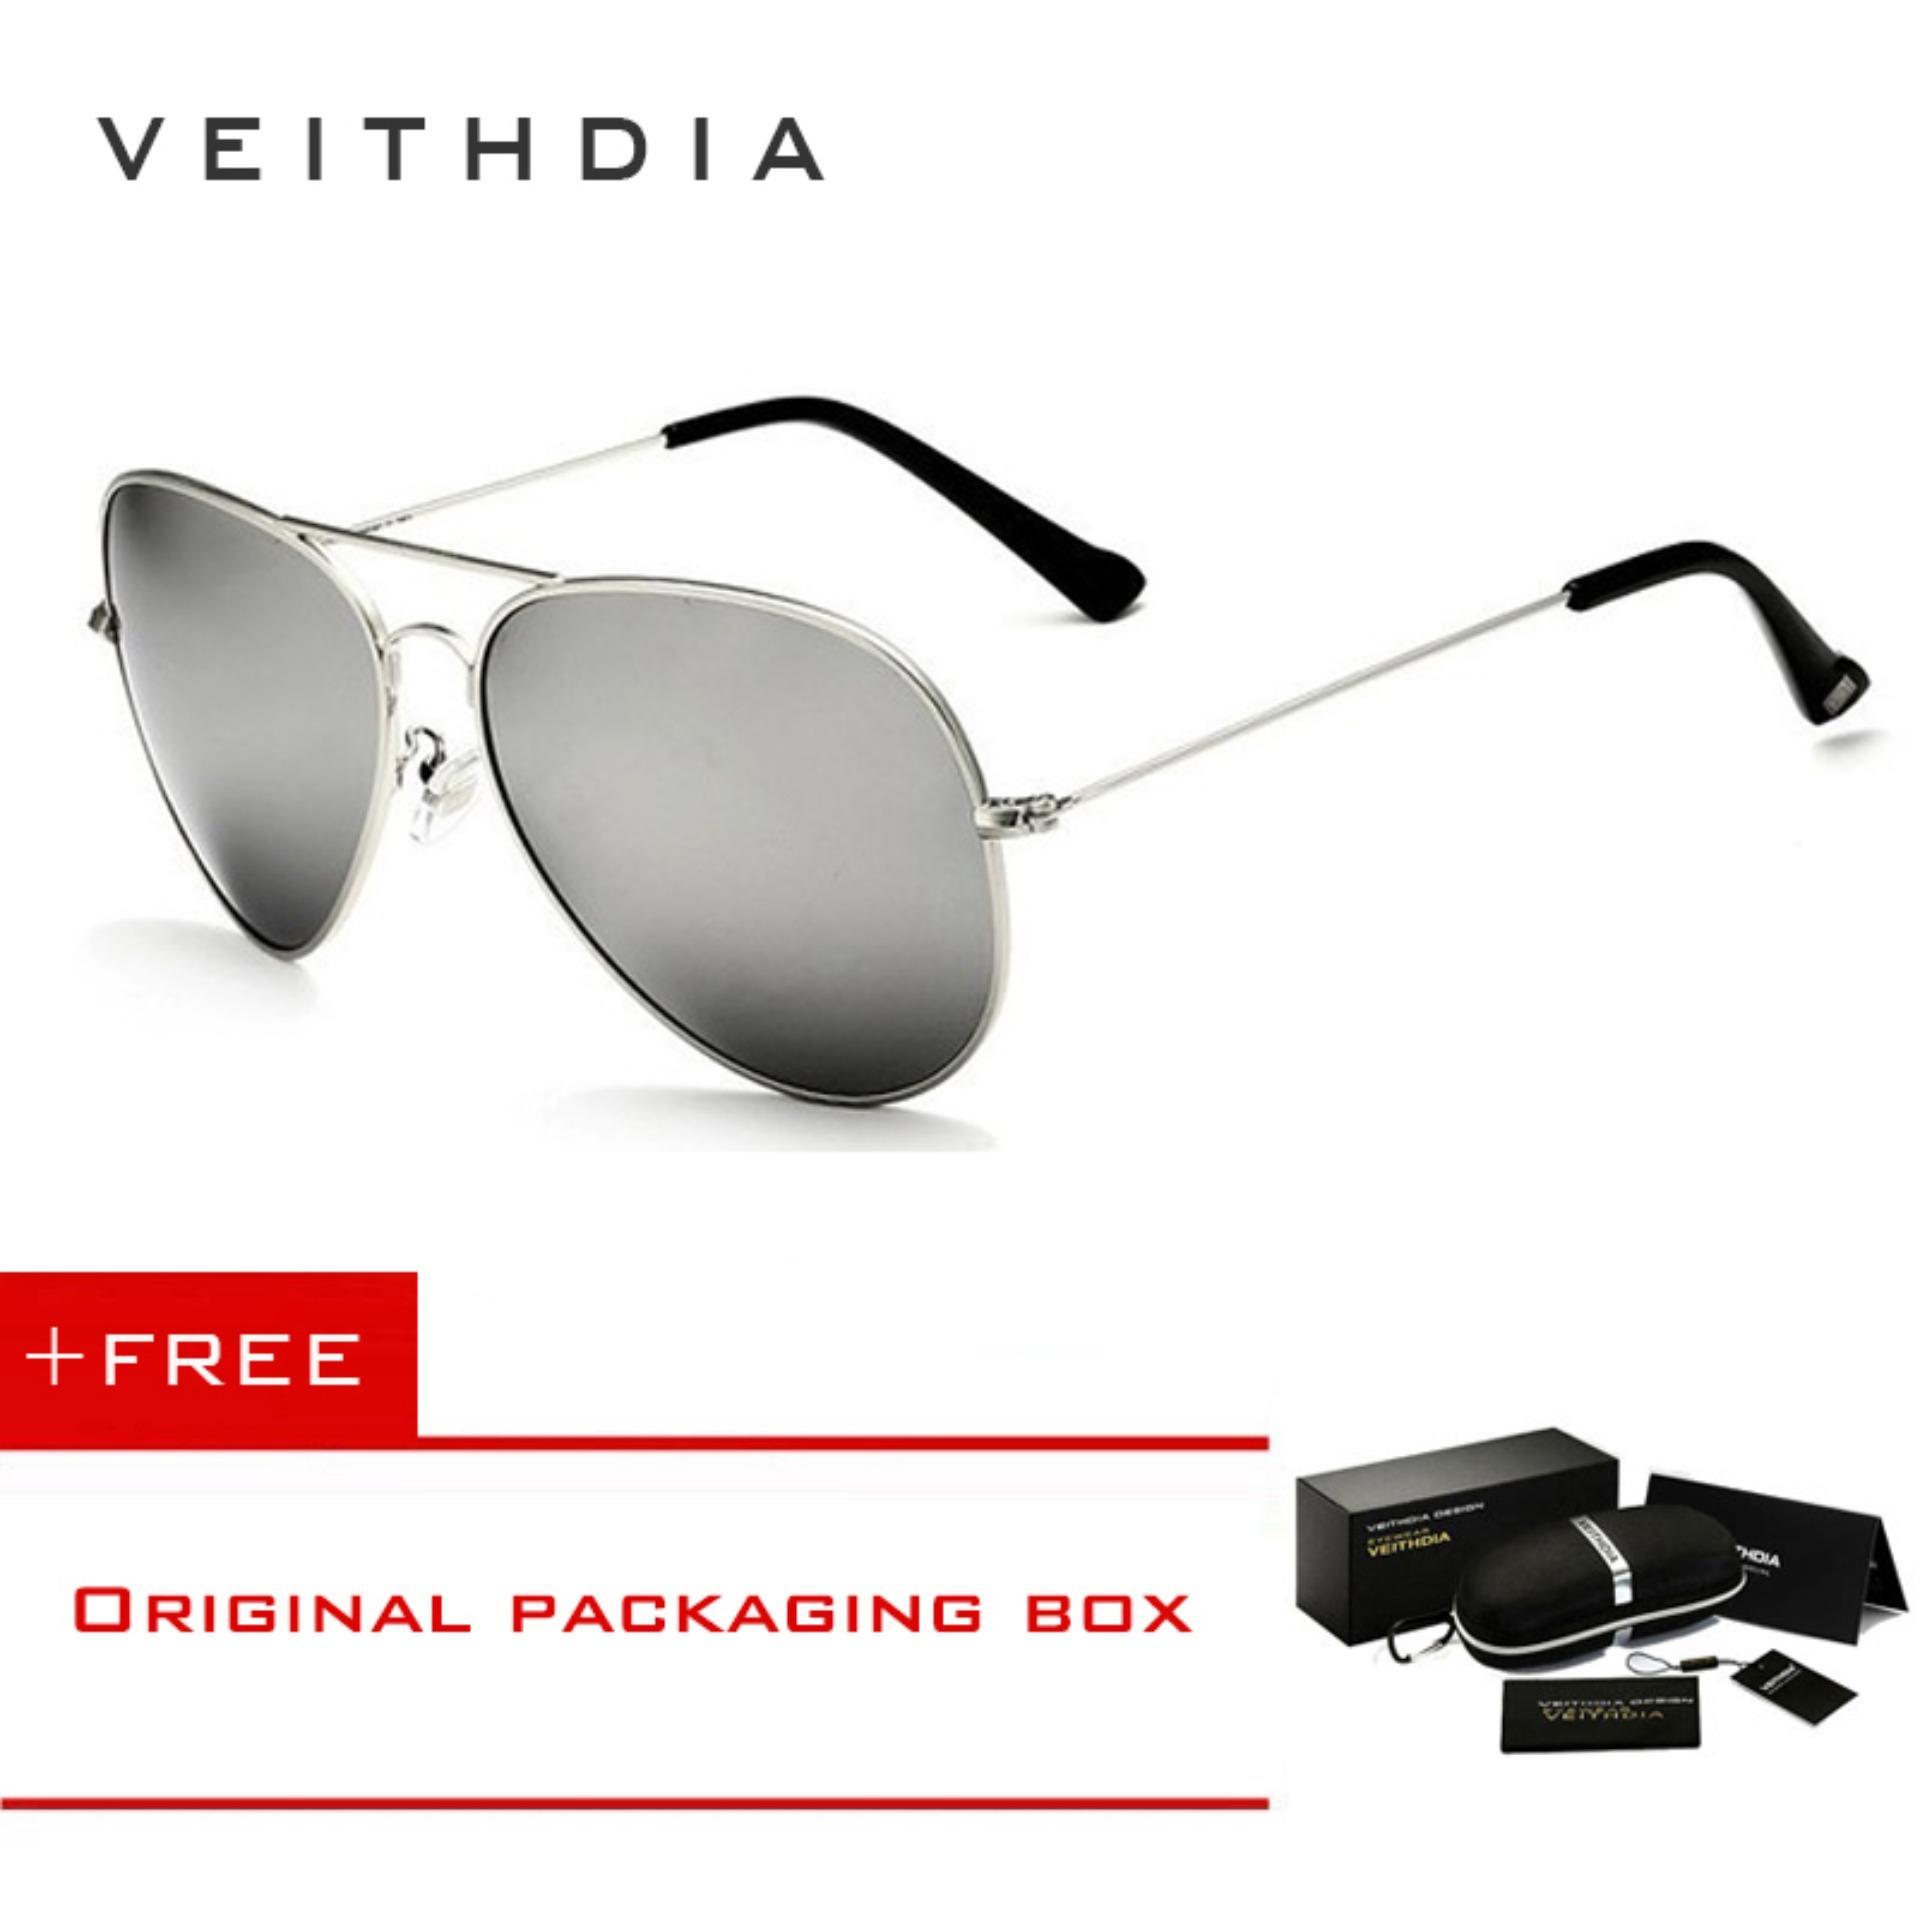 92e2c00c3e VEITHDIA Classic Fashion Polarized Sunglasses Men Women Eyewear Accessories  Sun Glasses 3026